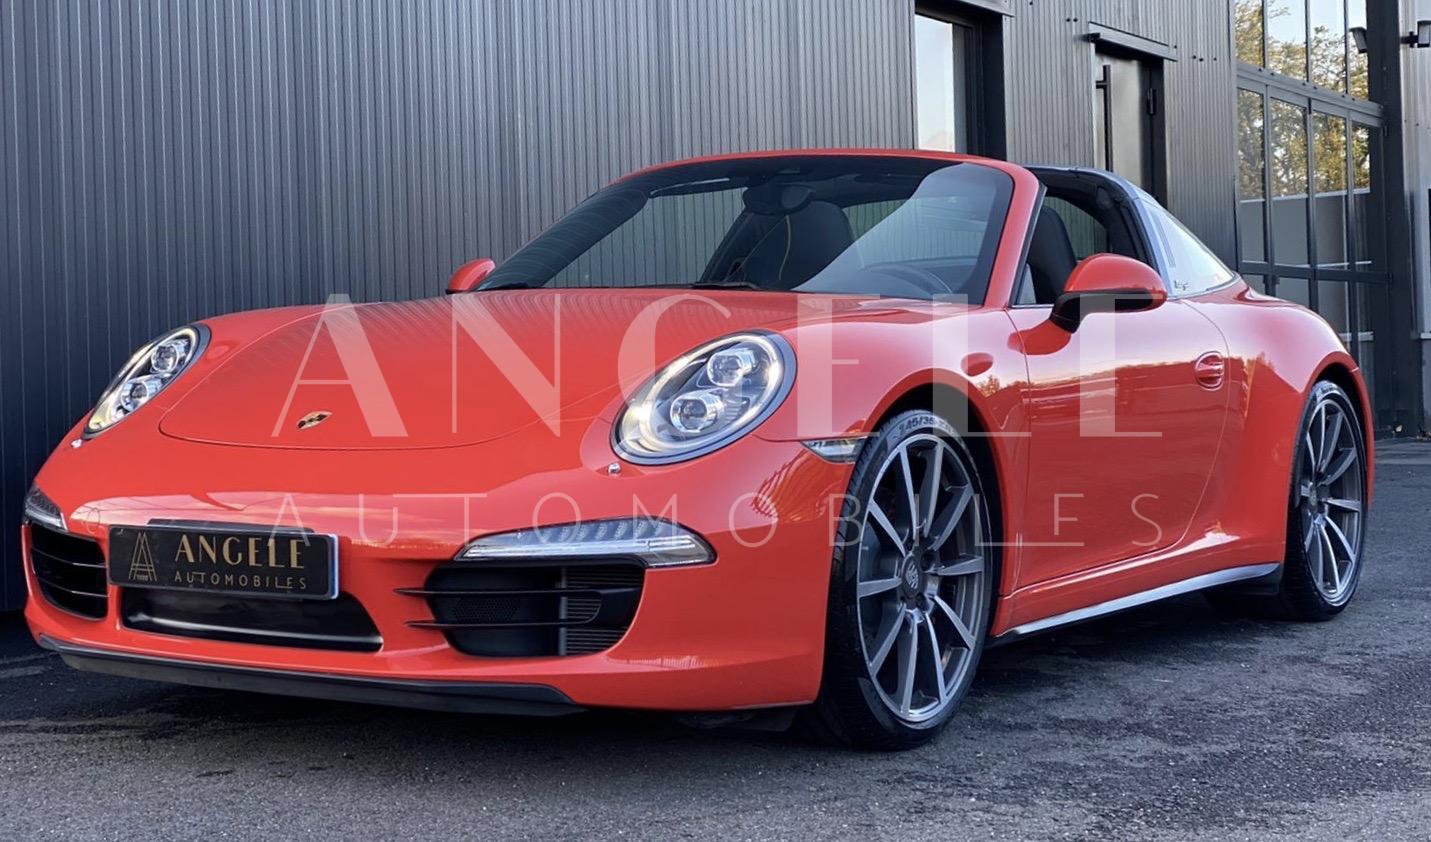 Porsche 991 Targa 4 S Orange fusion